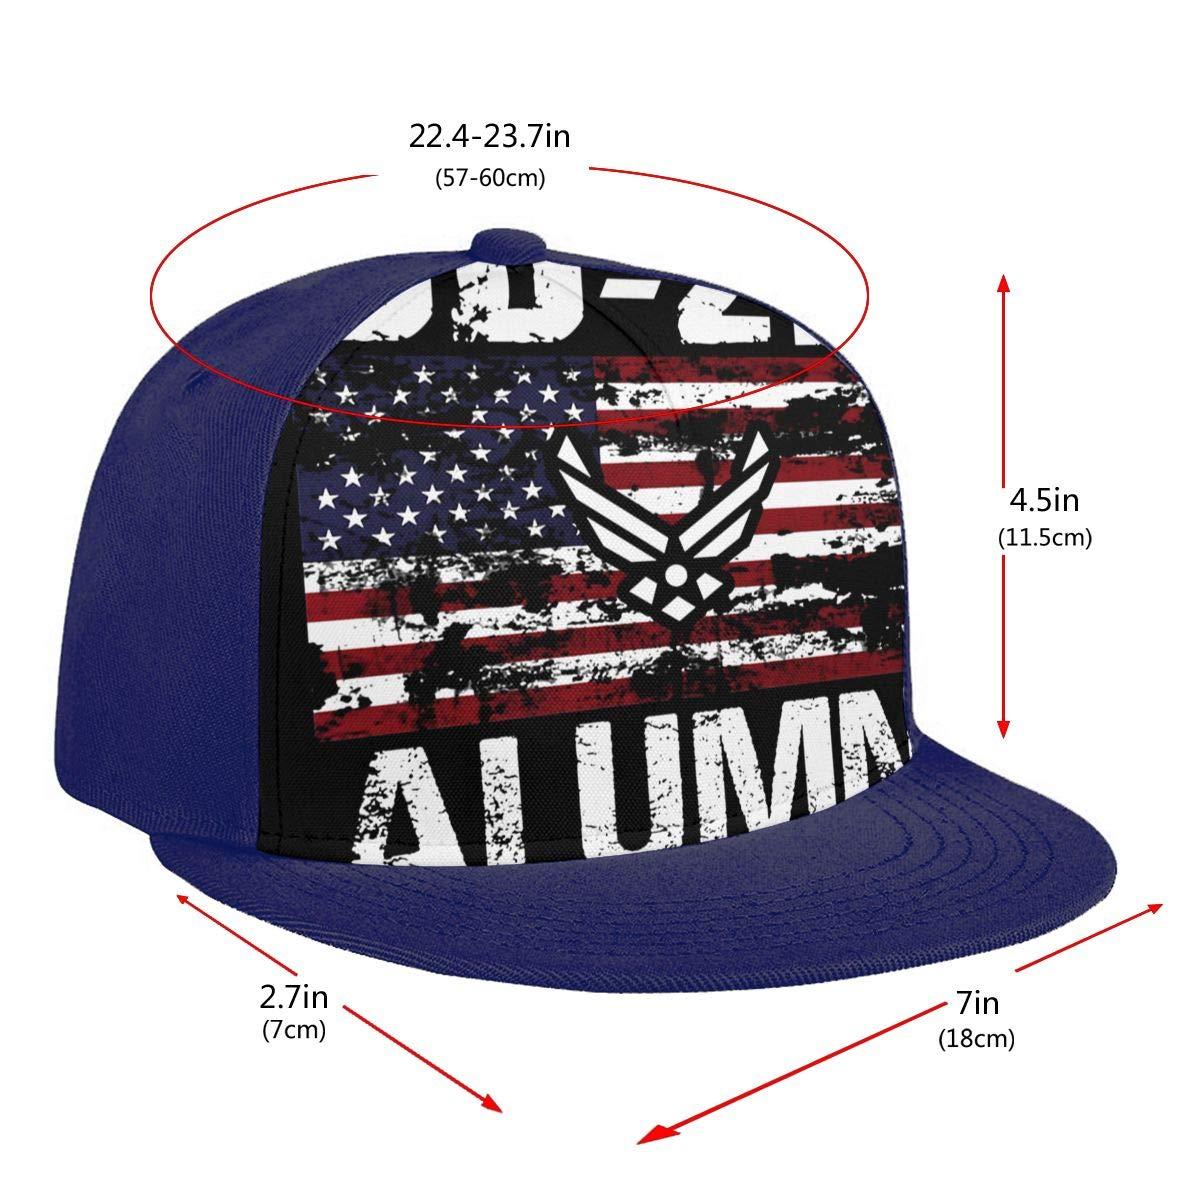 DD-214 Alumni US Armed Forces USA Flag Unisex Adult Hats Classic Baseball Caps Peaked Cap